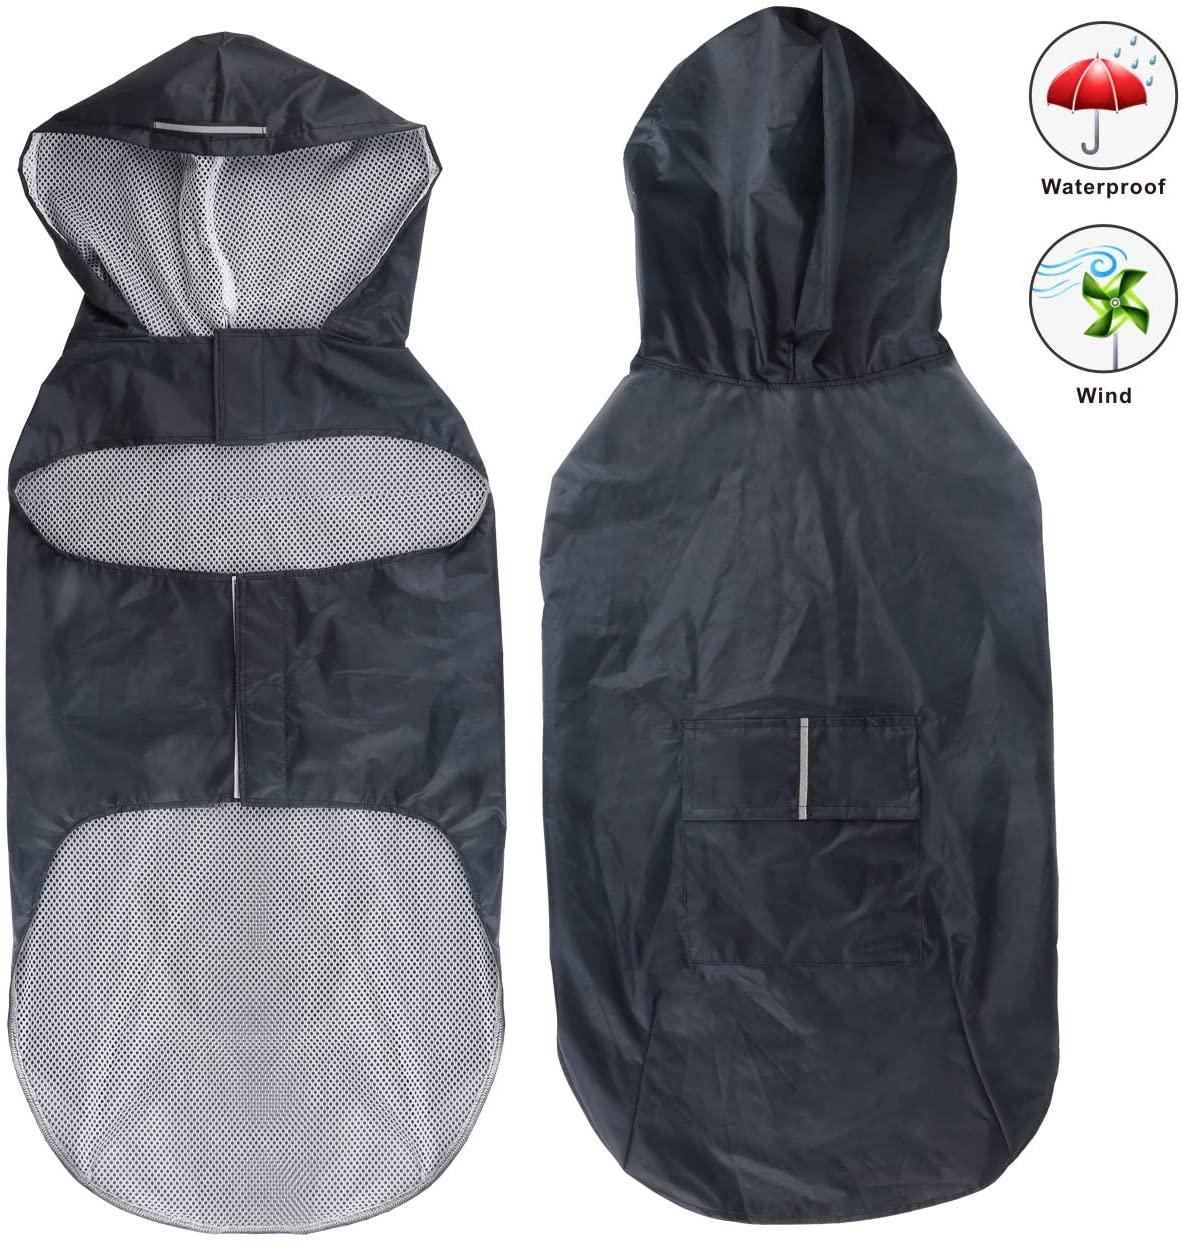 Idepet Dog Raincoat Waterproof Hoodie Jacket Rain Poncho Pet Rainwear Clothes with Reflective Stripe for Small Medium Large Dogs